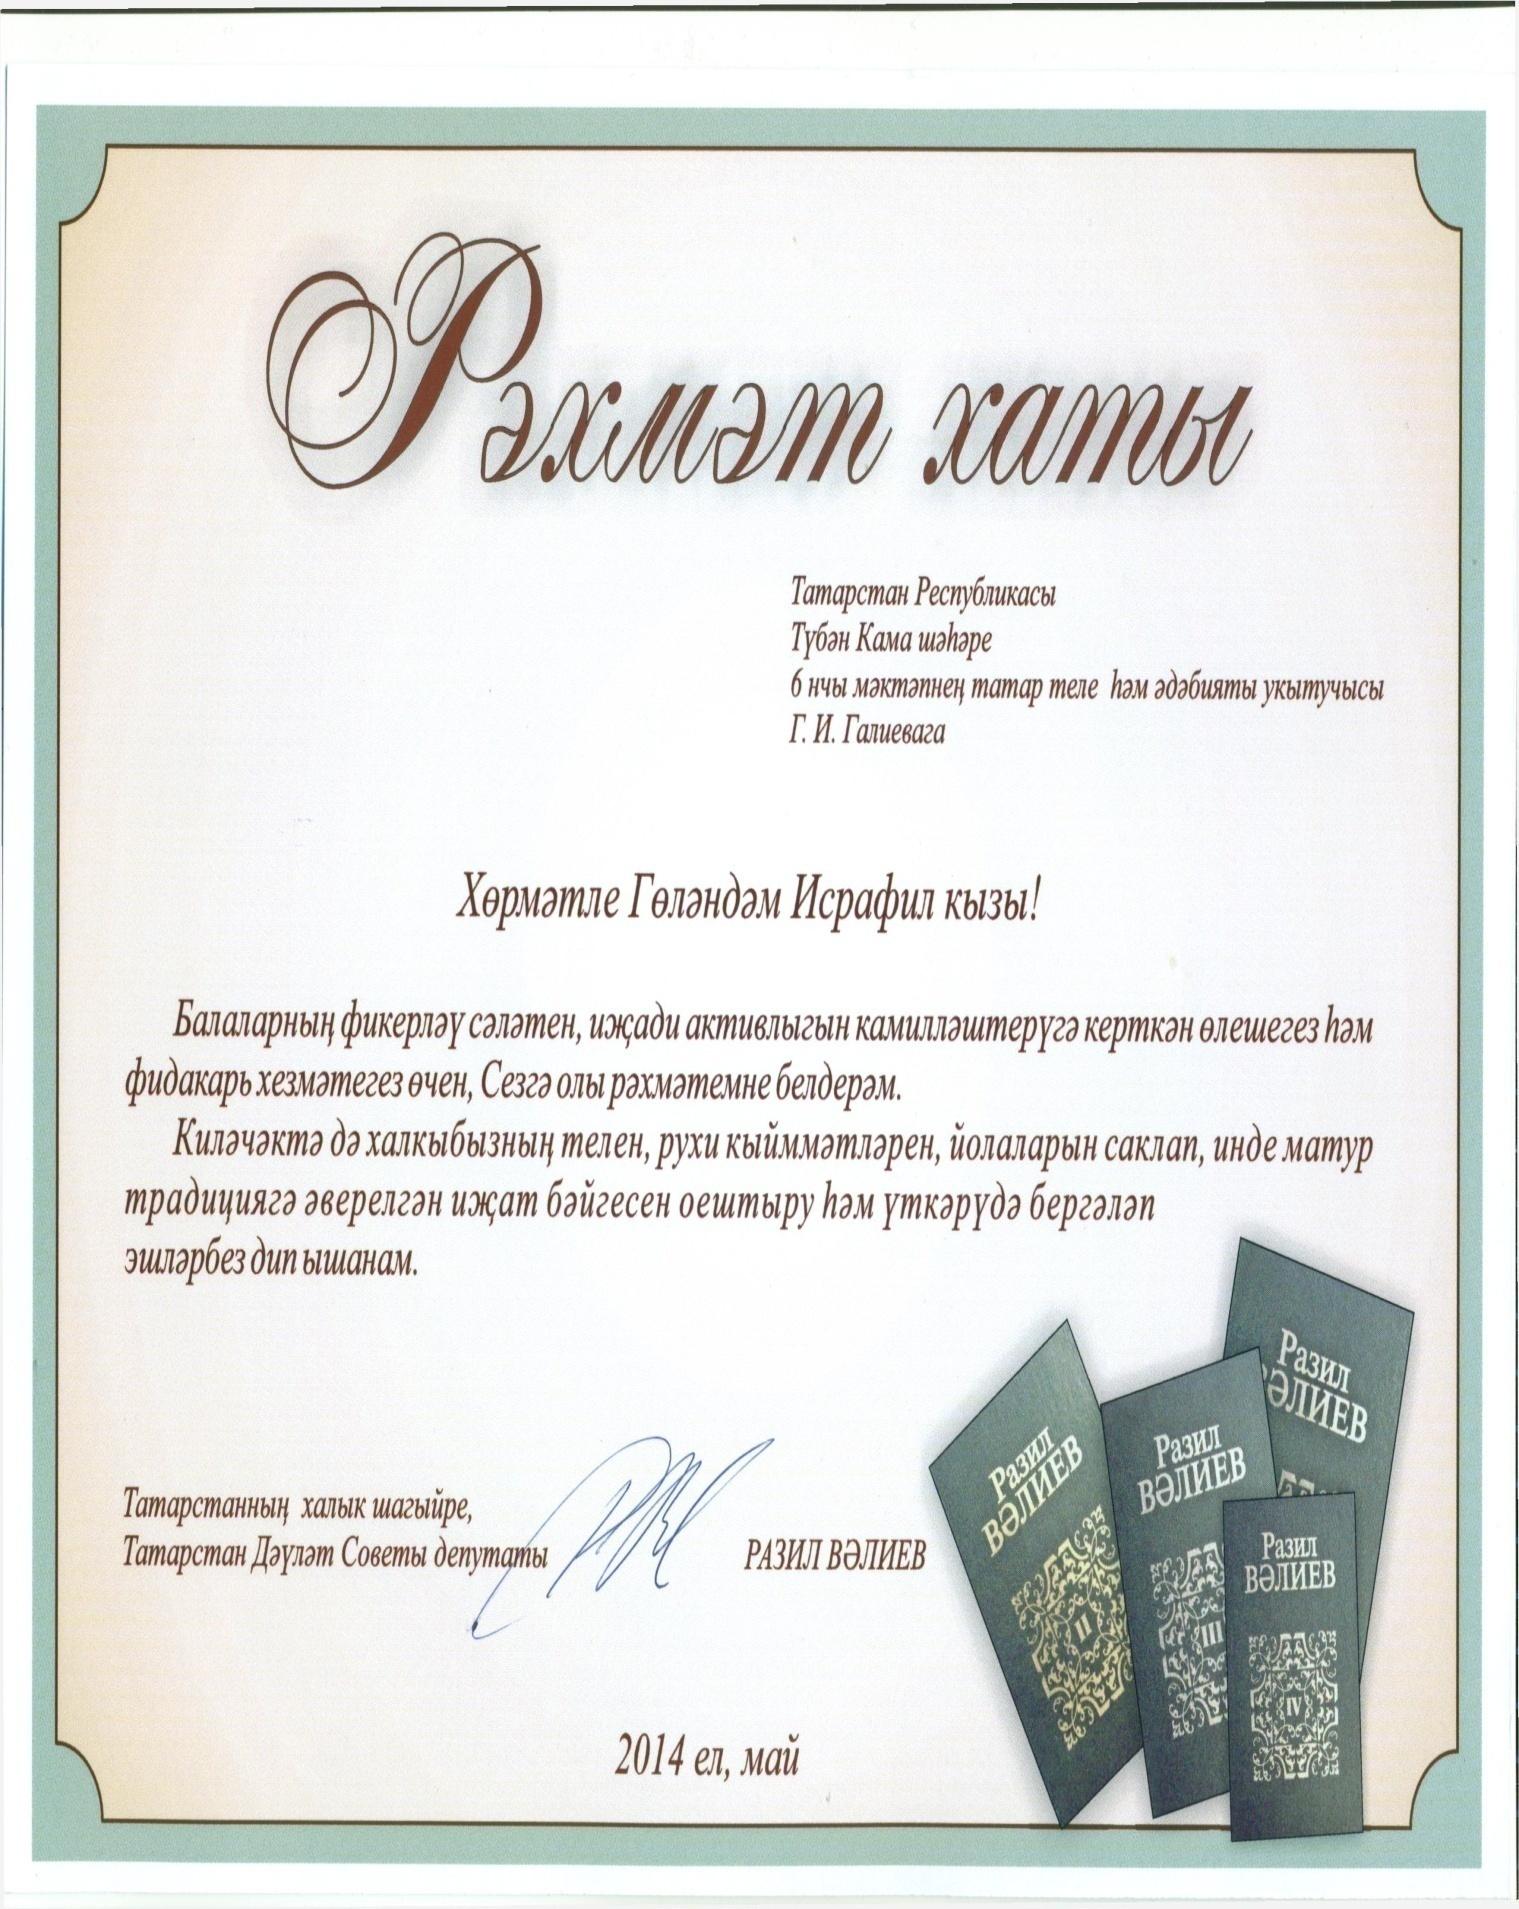 I:\дипломы\Рәхмәт хаты Валиева Р.jpg